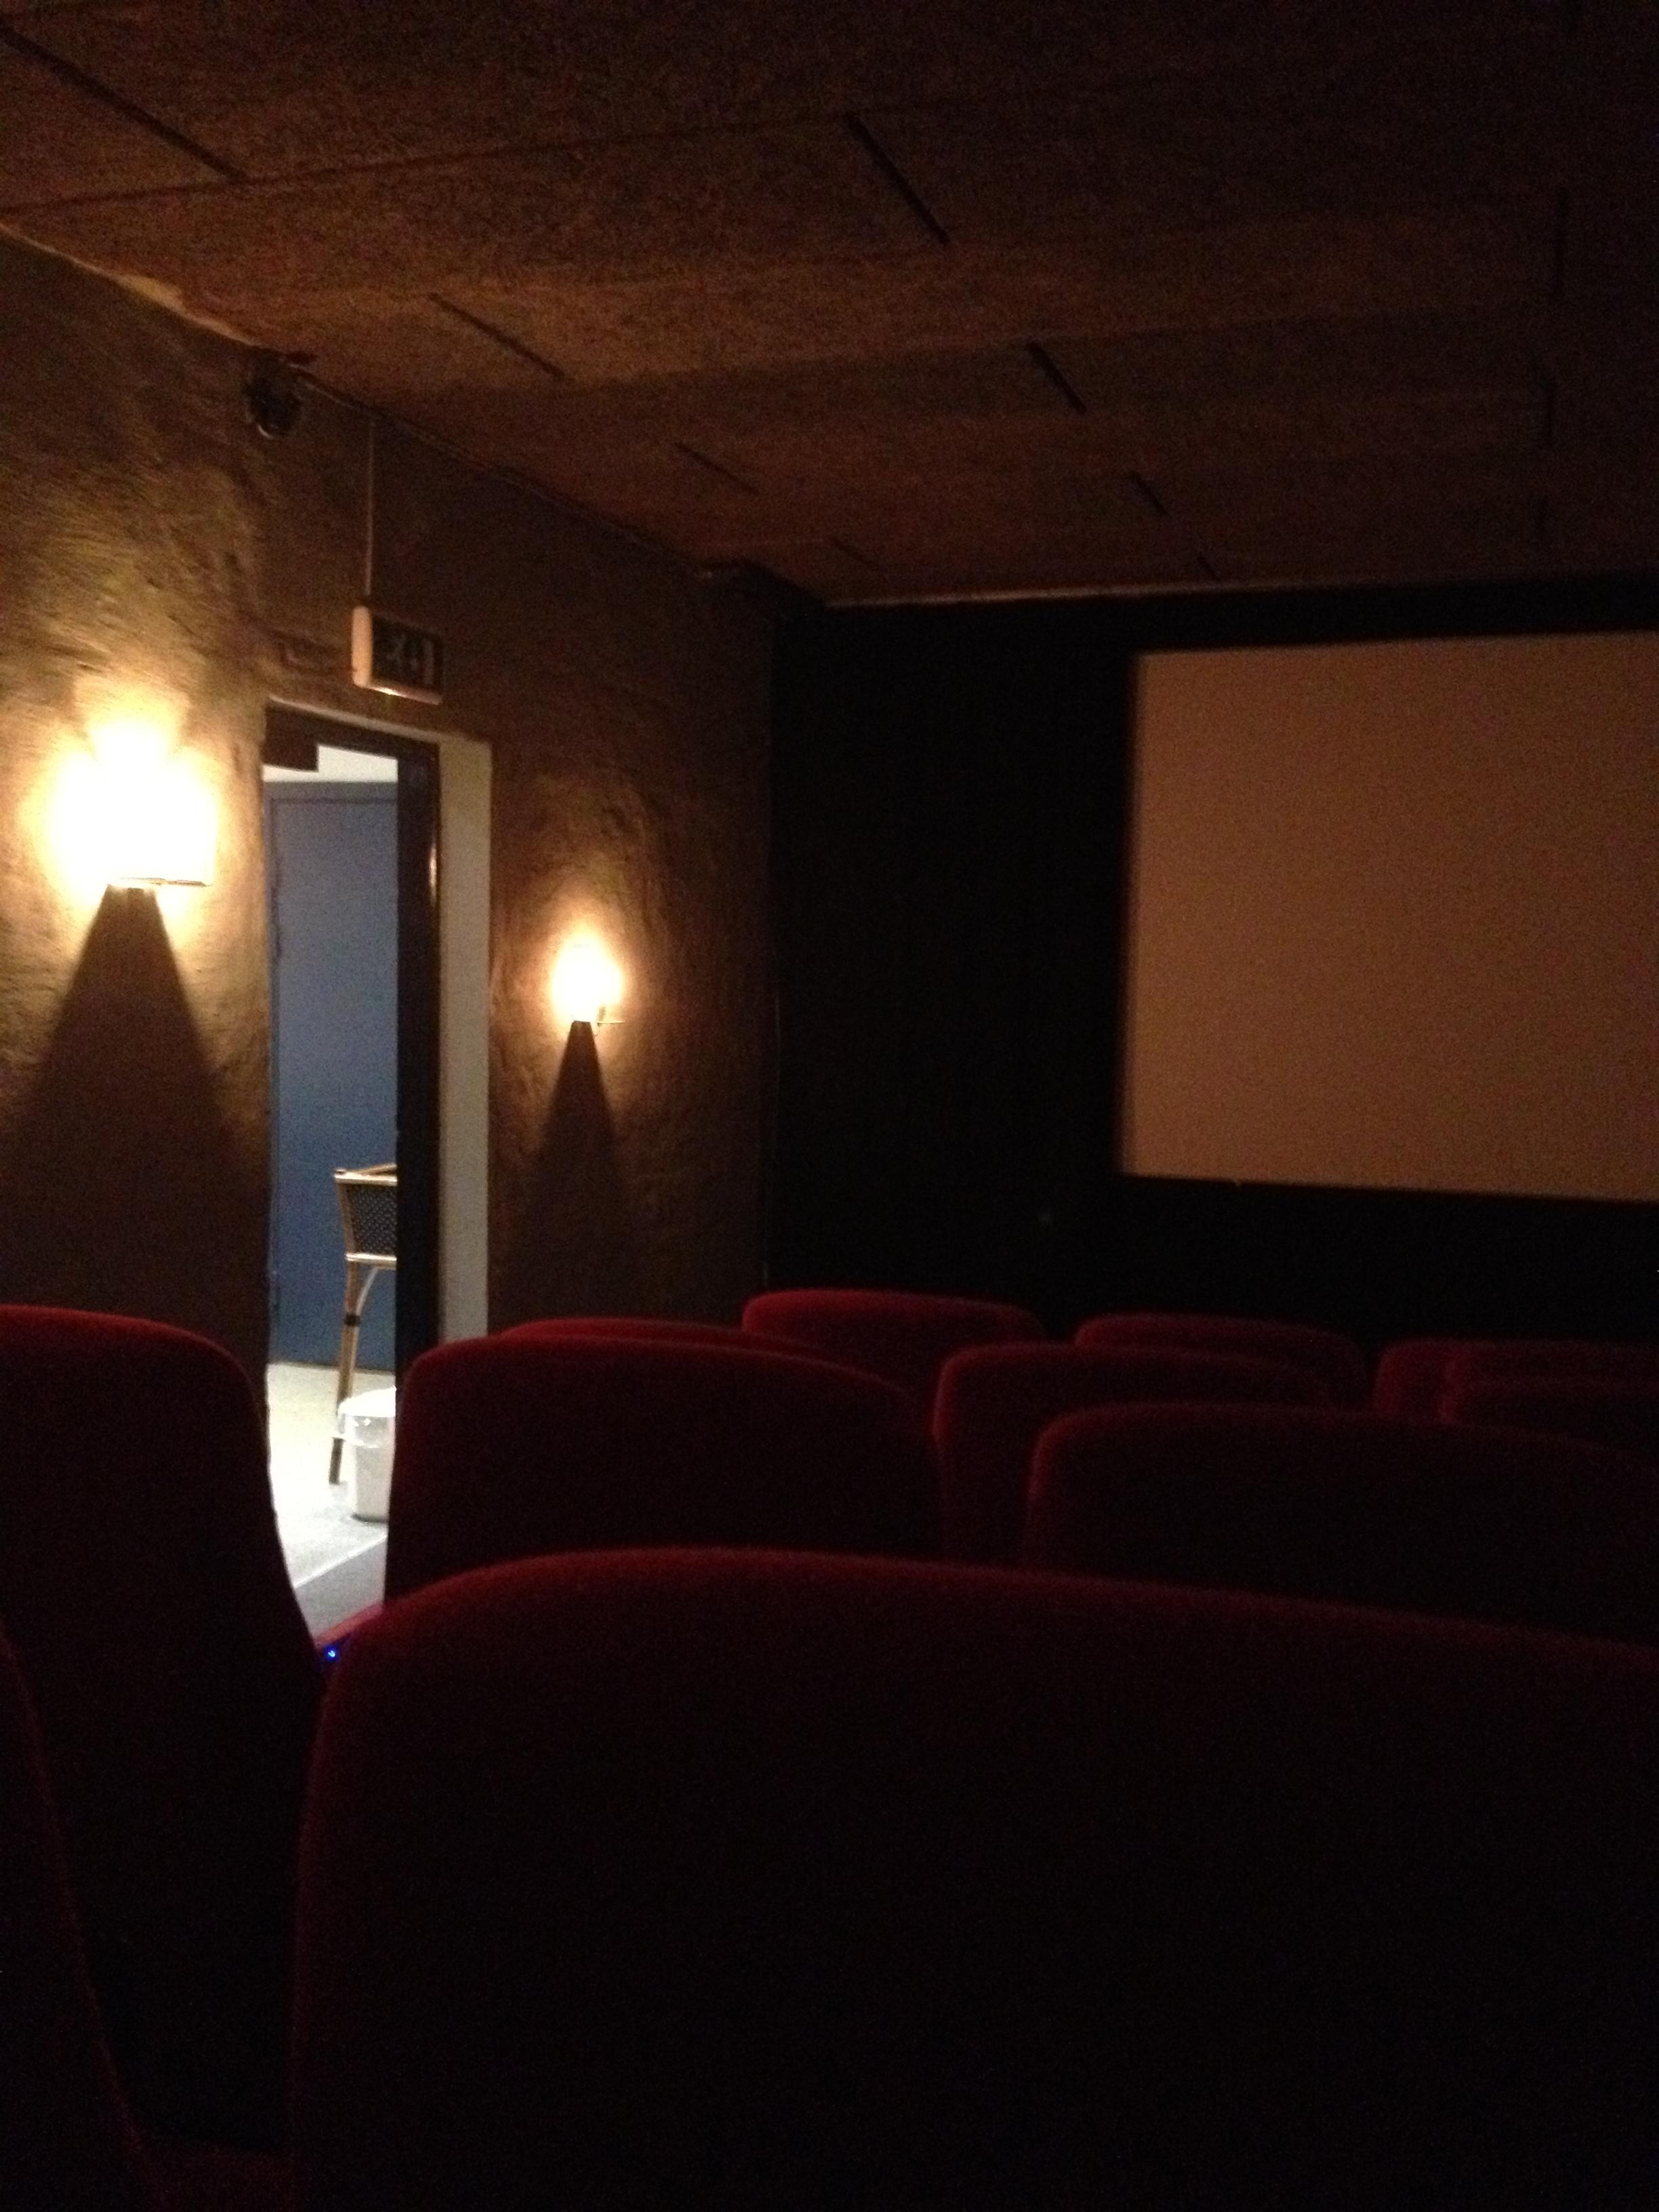 Inside Vester Vov Vov's second screen (photo by Paul Forrester)